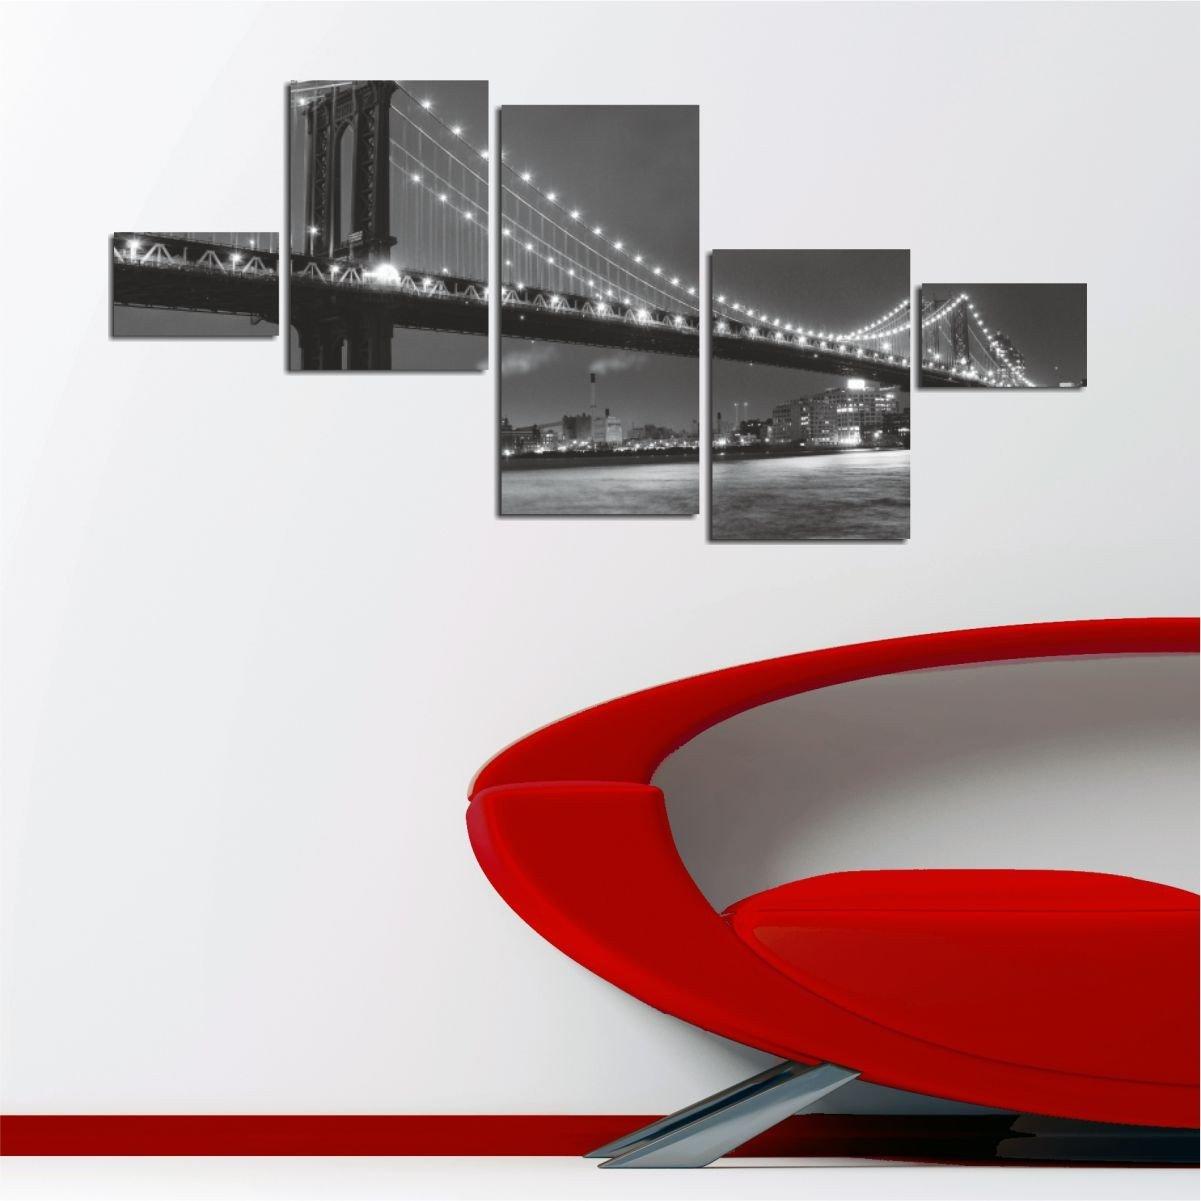 LaModaHome Decorative 100% MDF Wall Art 5 Panels (22'' x 9.4'' Total) Ready to Hang Painting Night Light Bridge Structure Brooklyn America Sea by LaModaHome